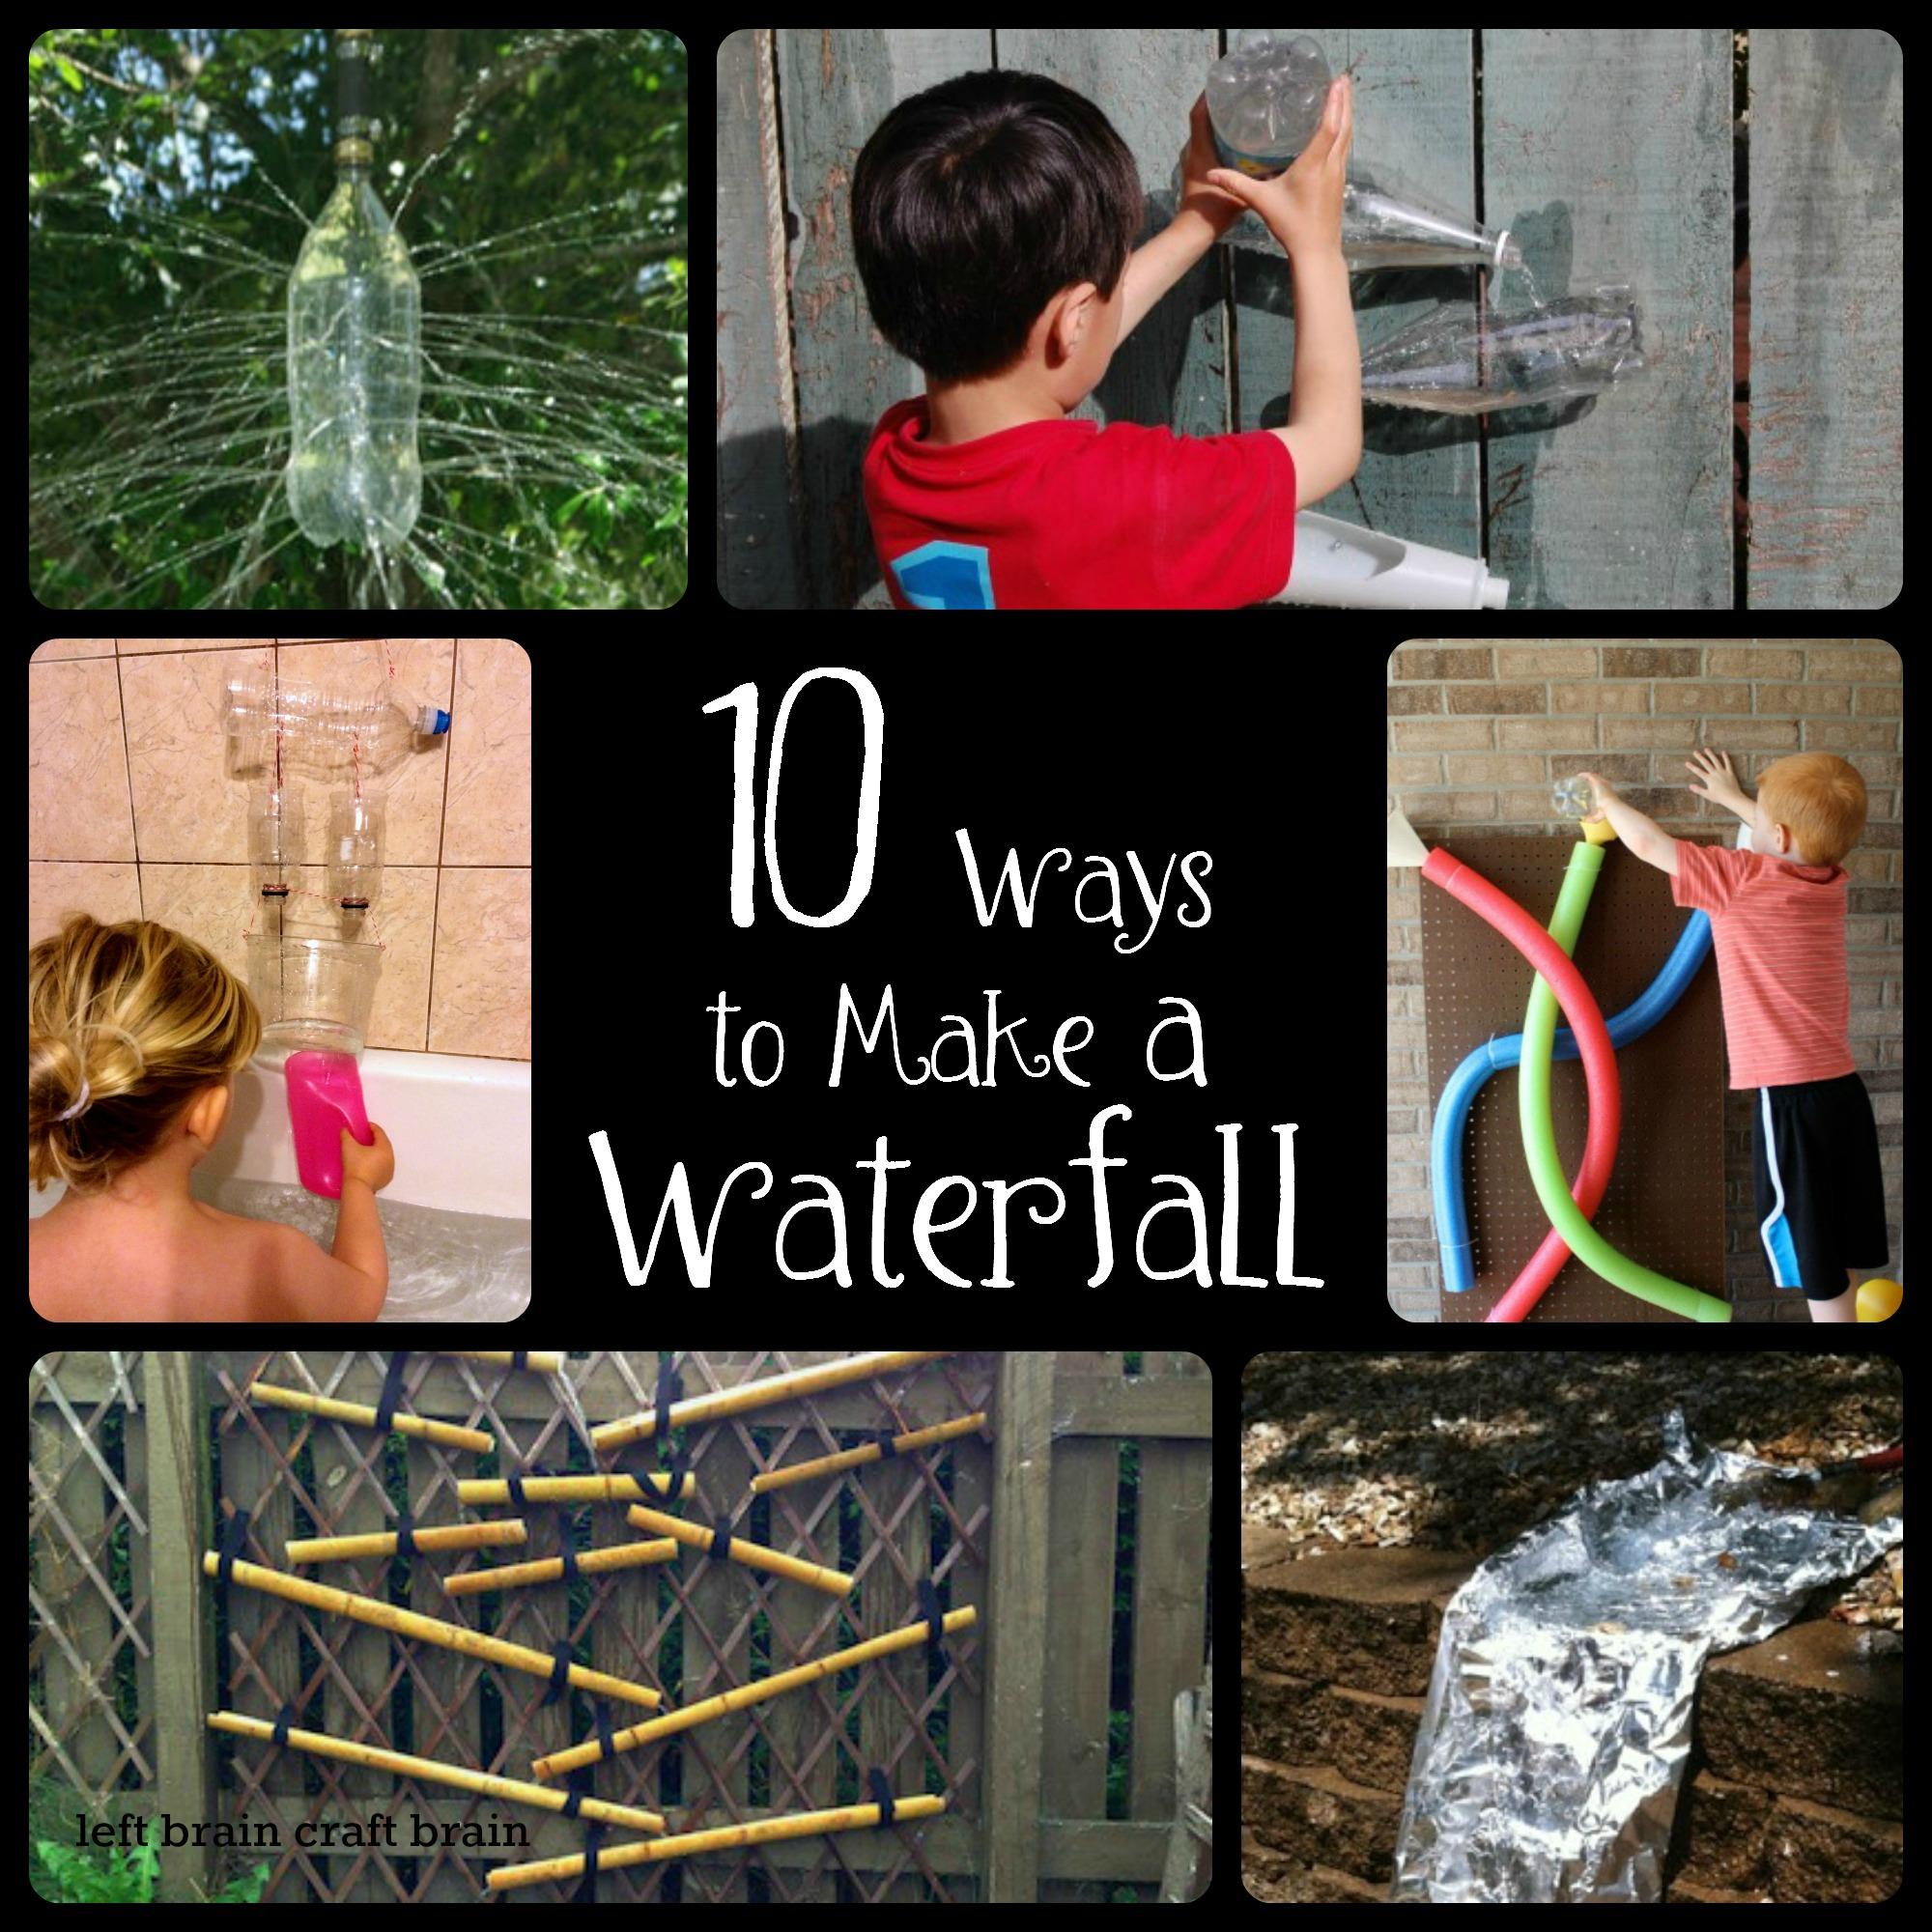 10 ways to make a waterfall left brain craft brain